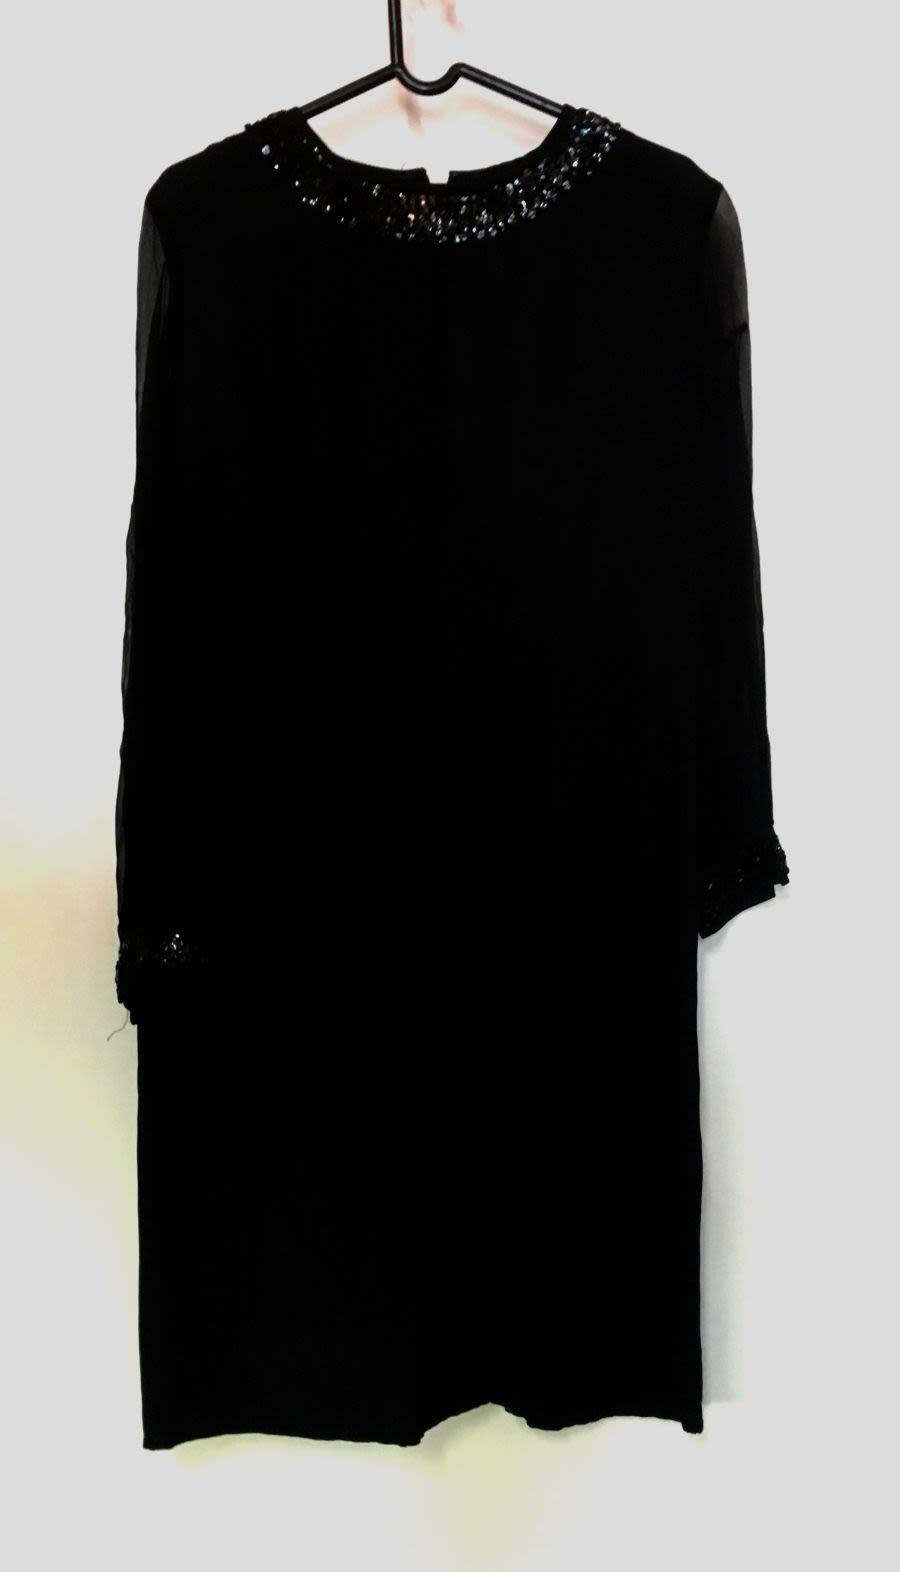 Vintage 60's Sequin Sheer Sleeve Detail Black Midi Dress